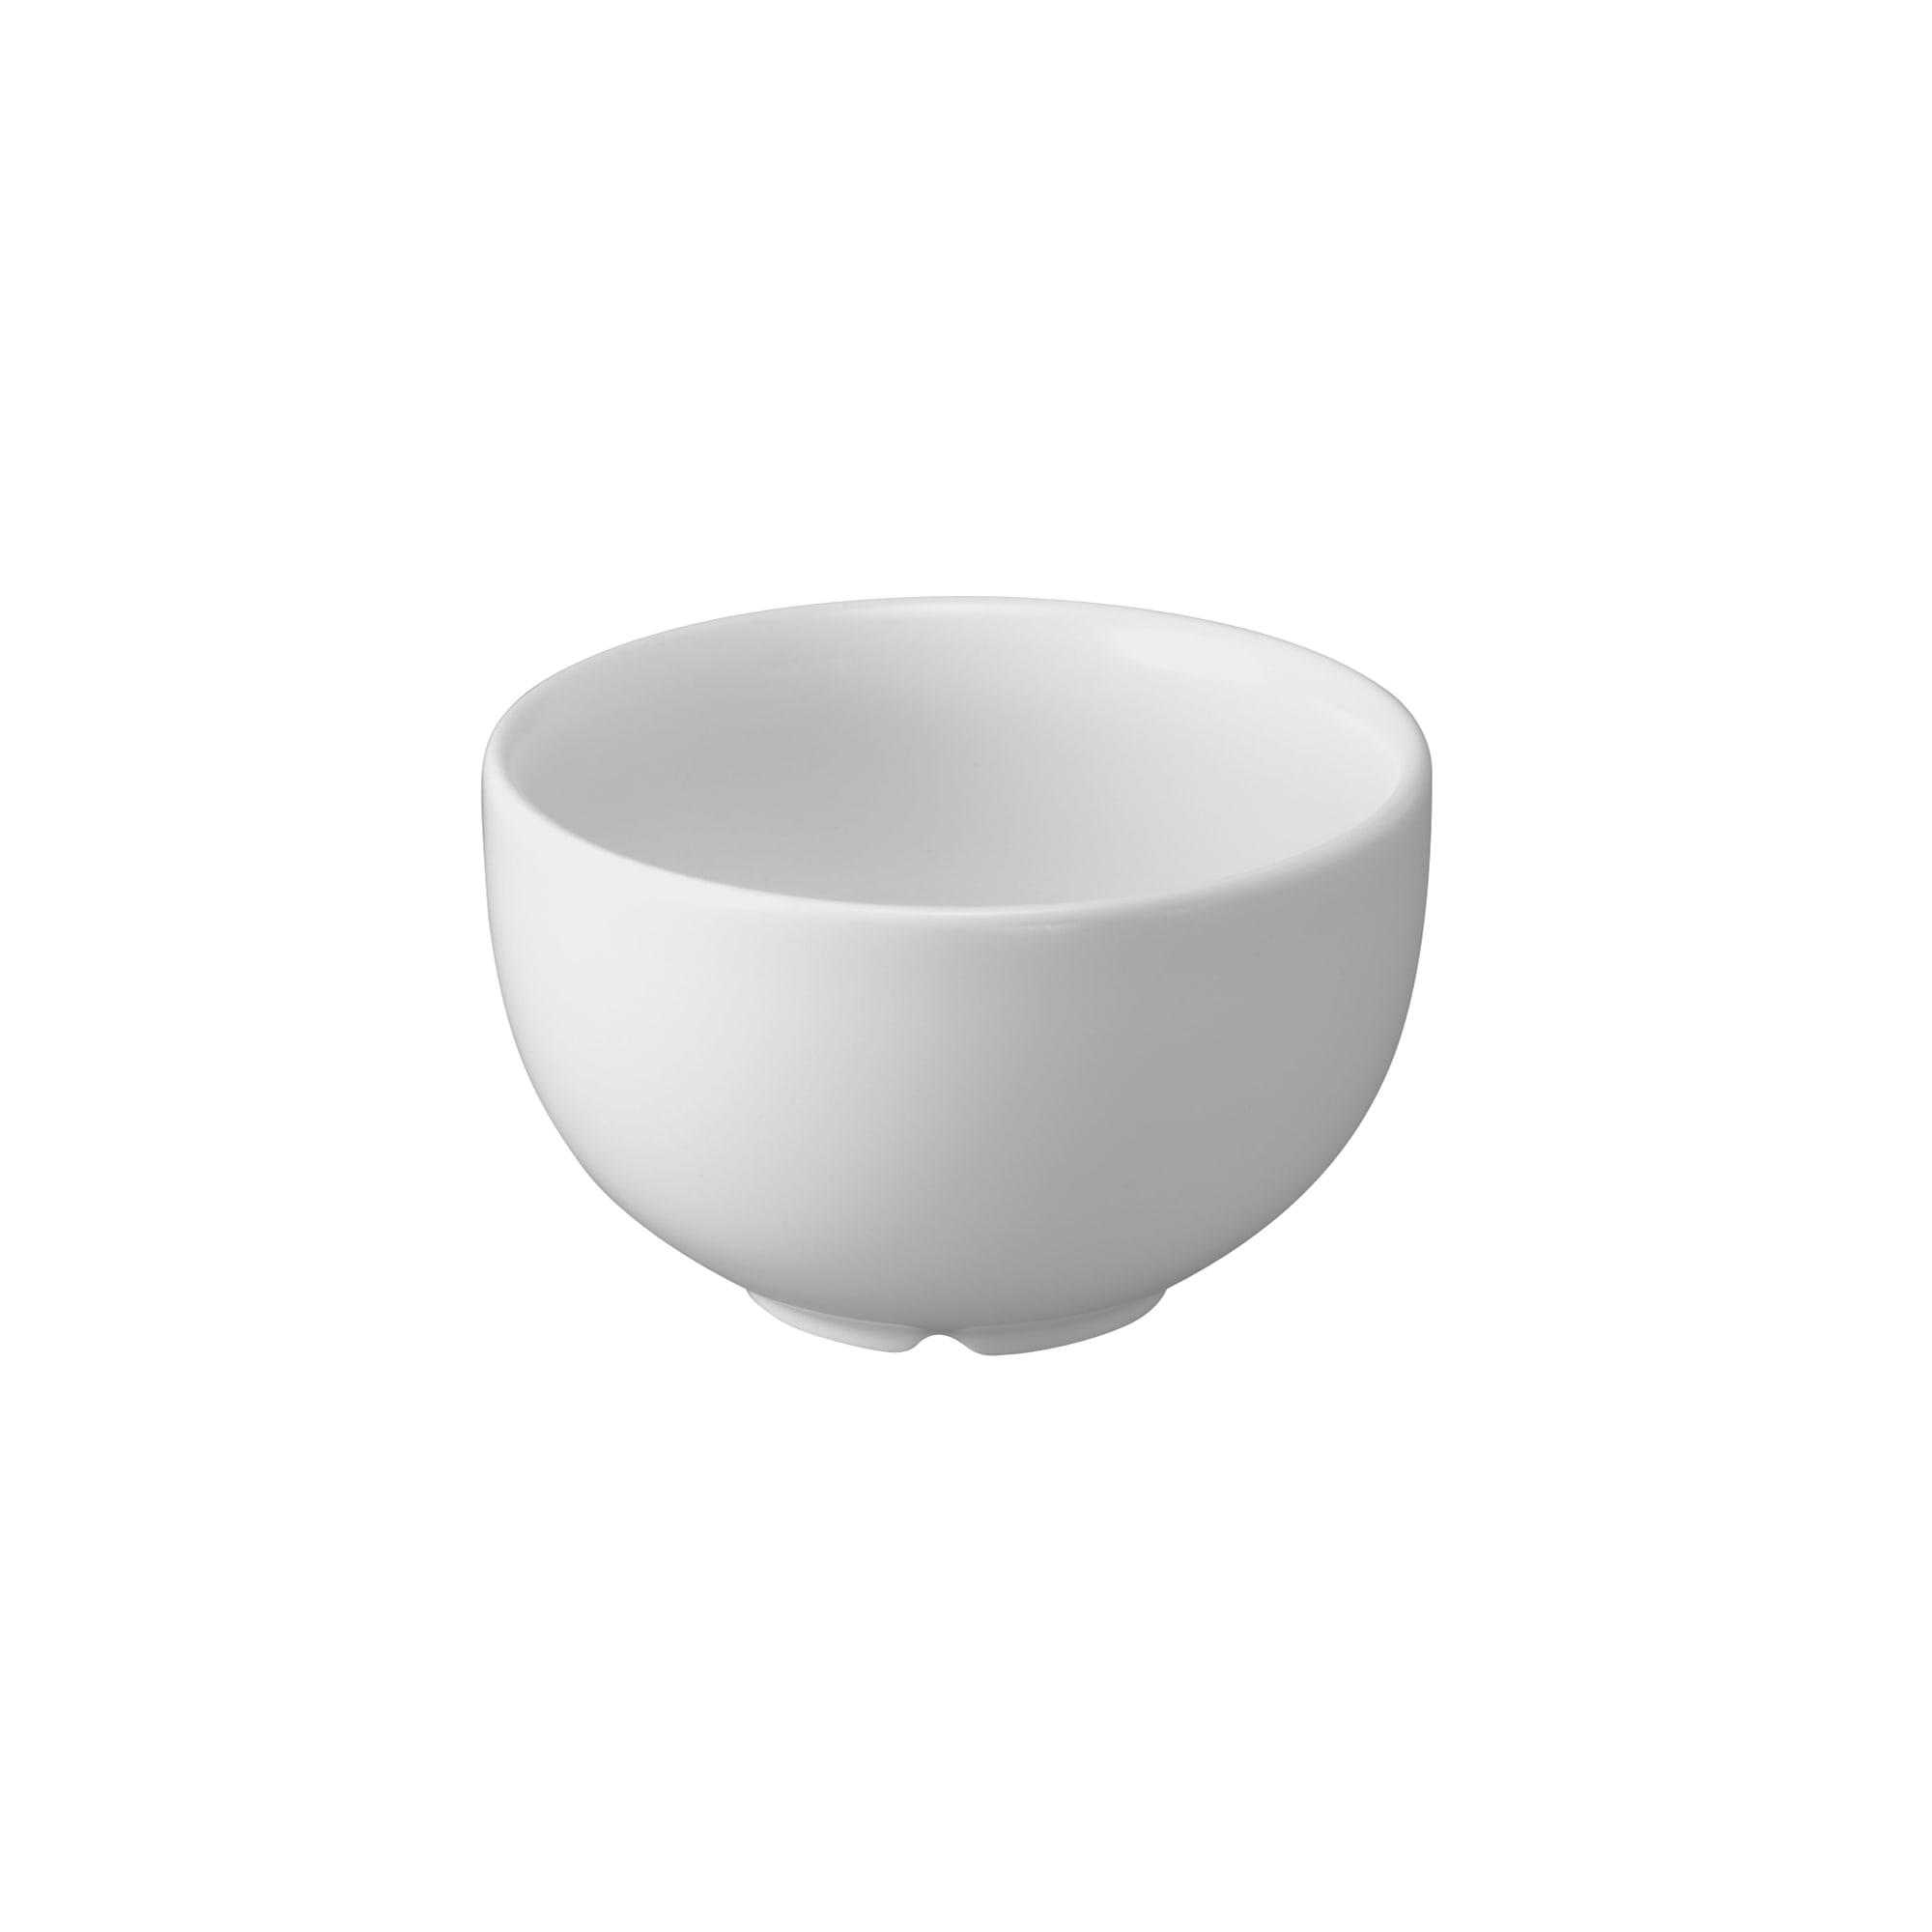 Churchill WHSB1 19-oz Snack Attack Soup Bowl - Ceramic, White